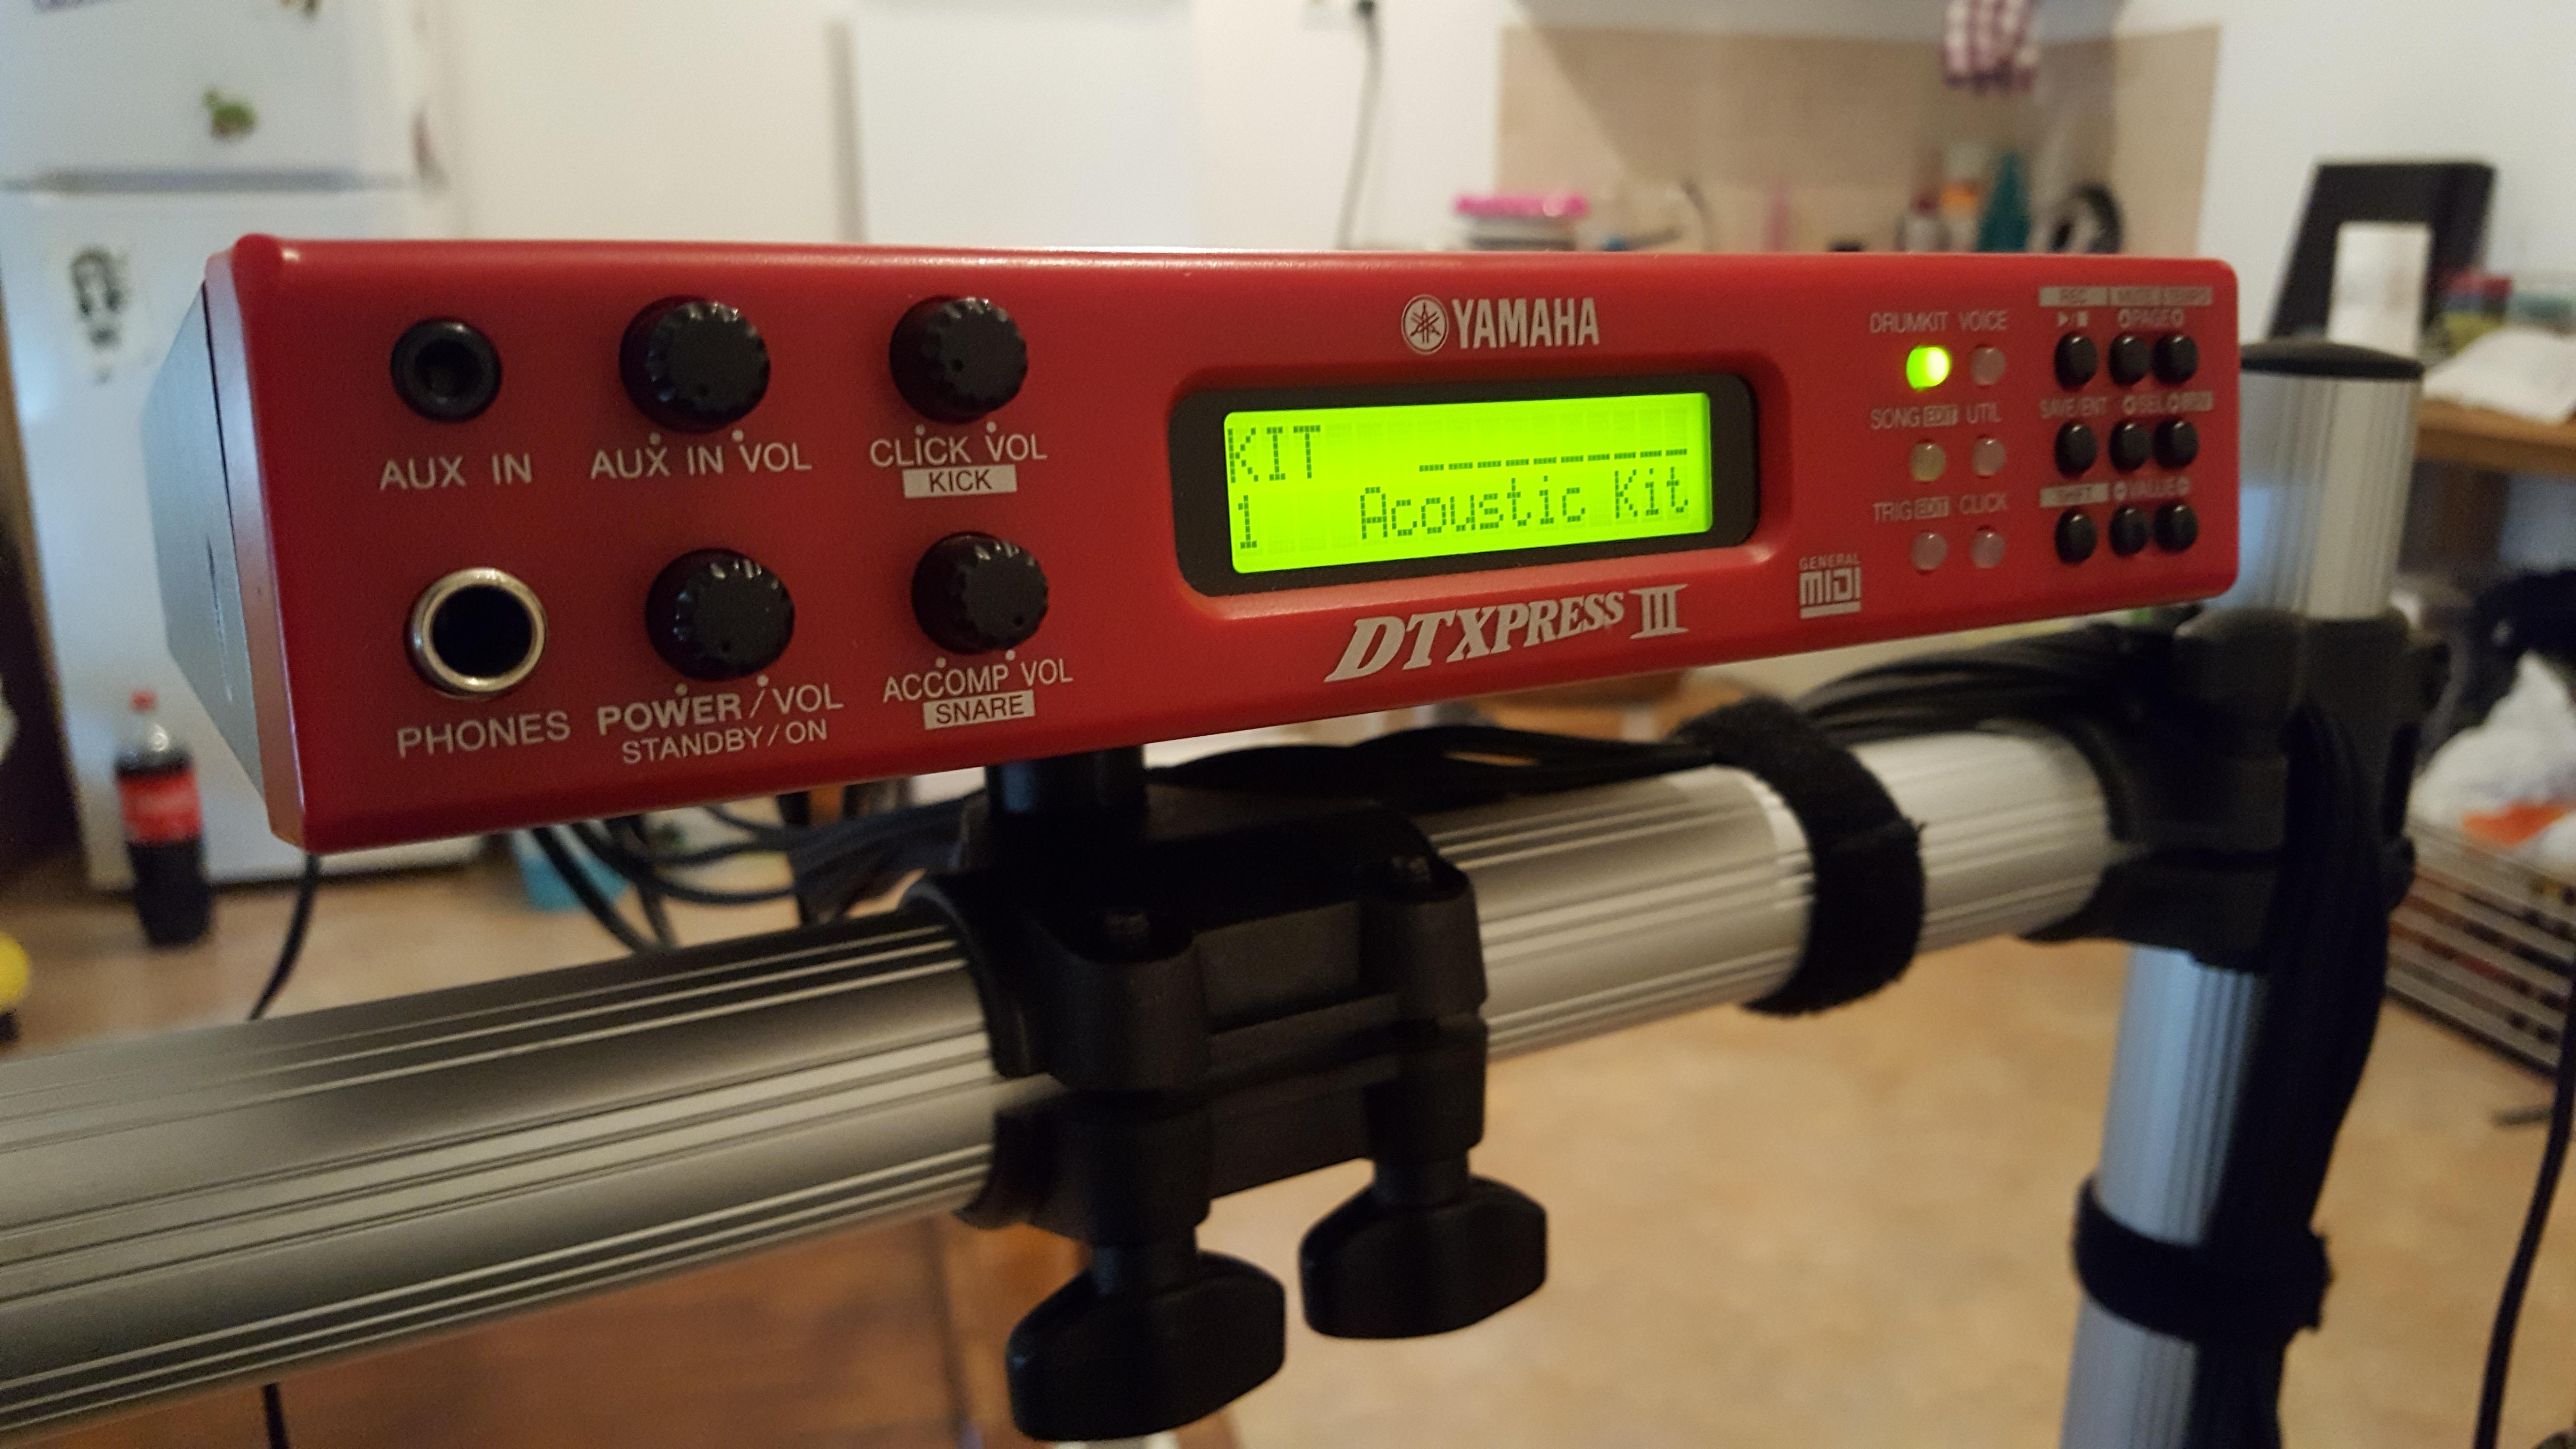 Yamaha dtxpress iii special image 1577426 audiofanzine for Yamaha dtxpress review